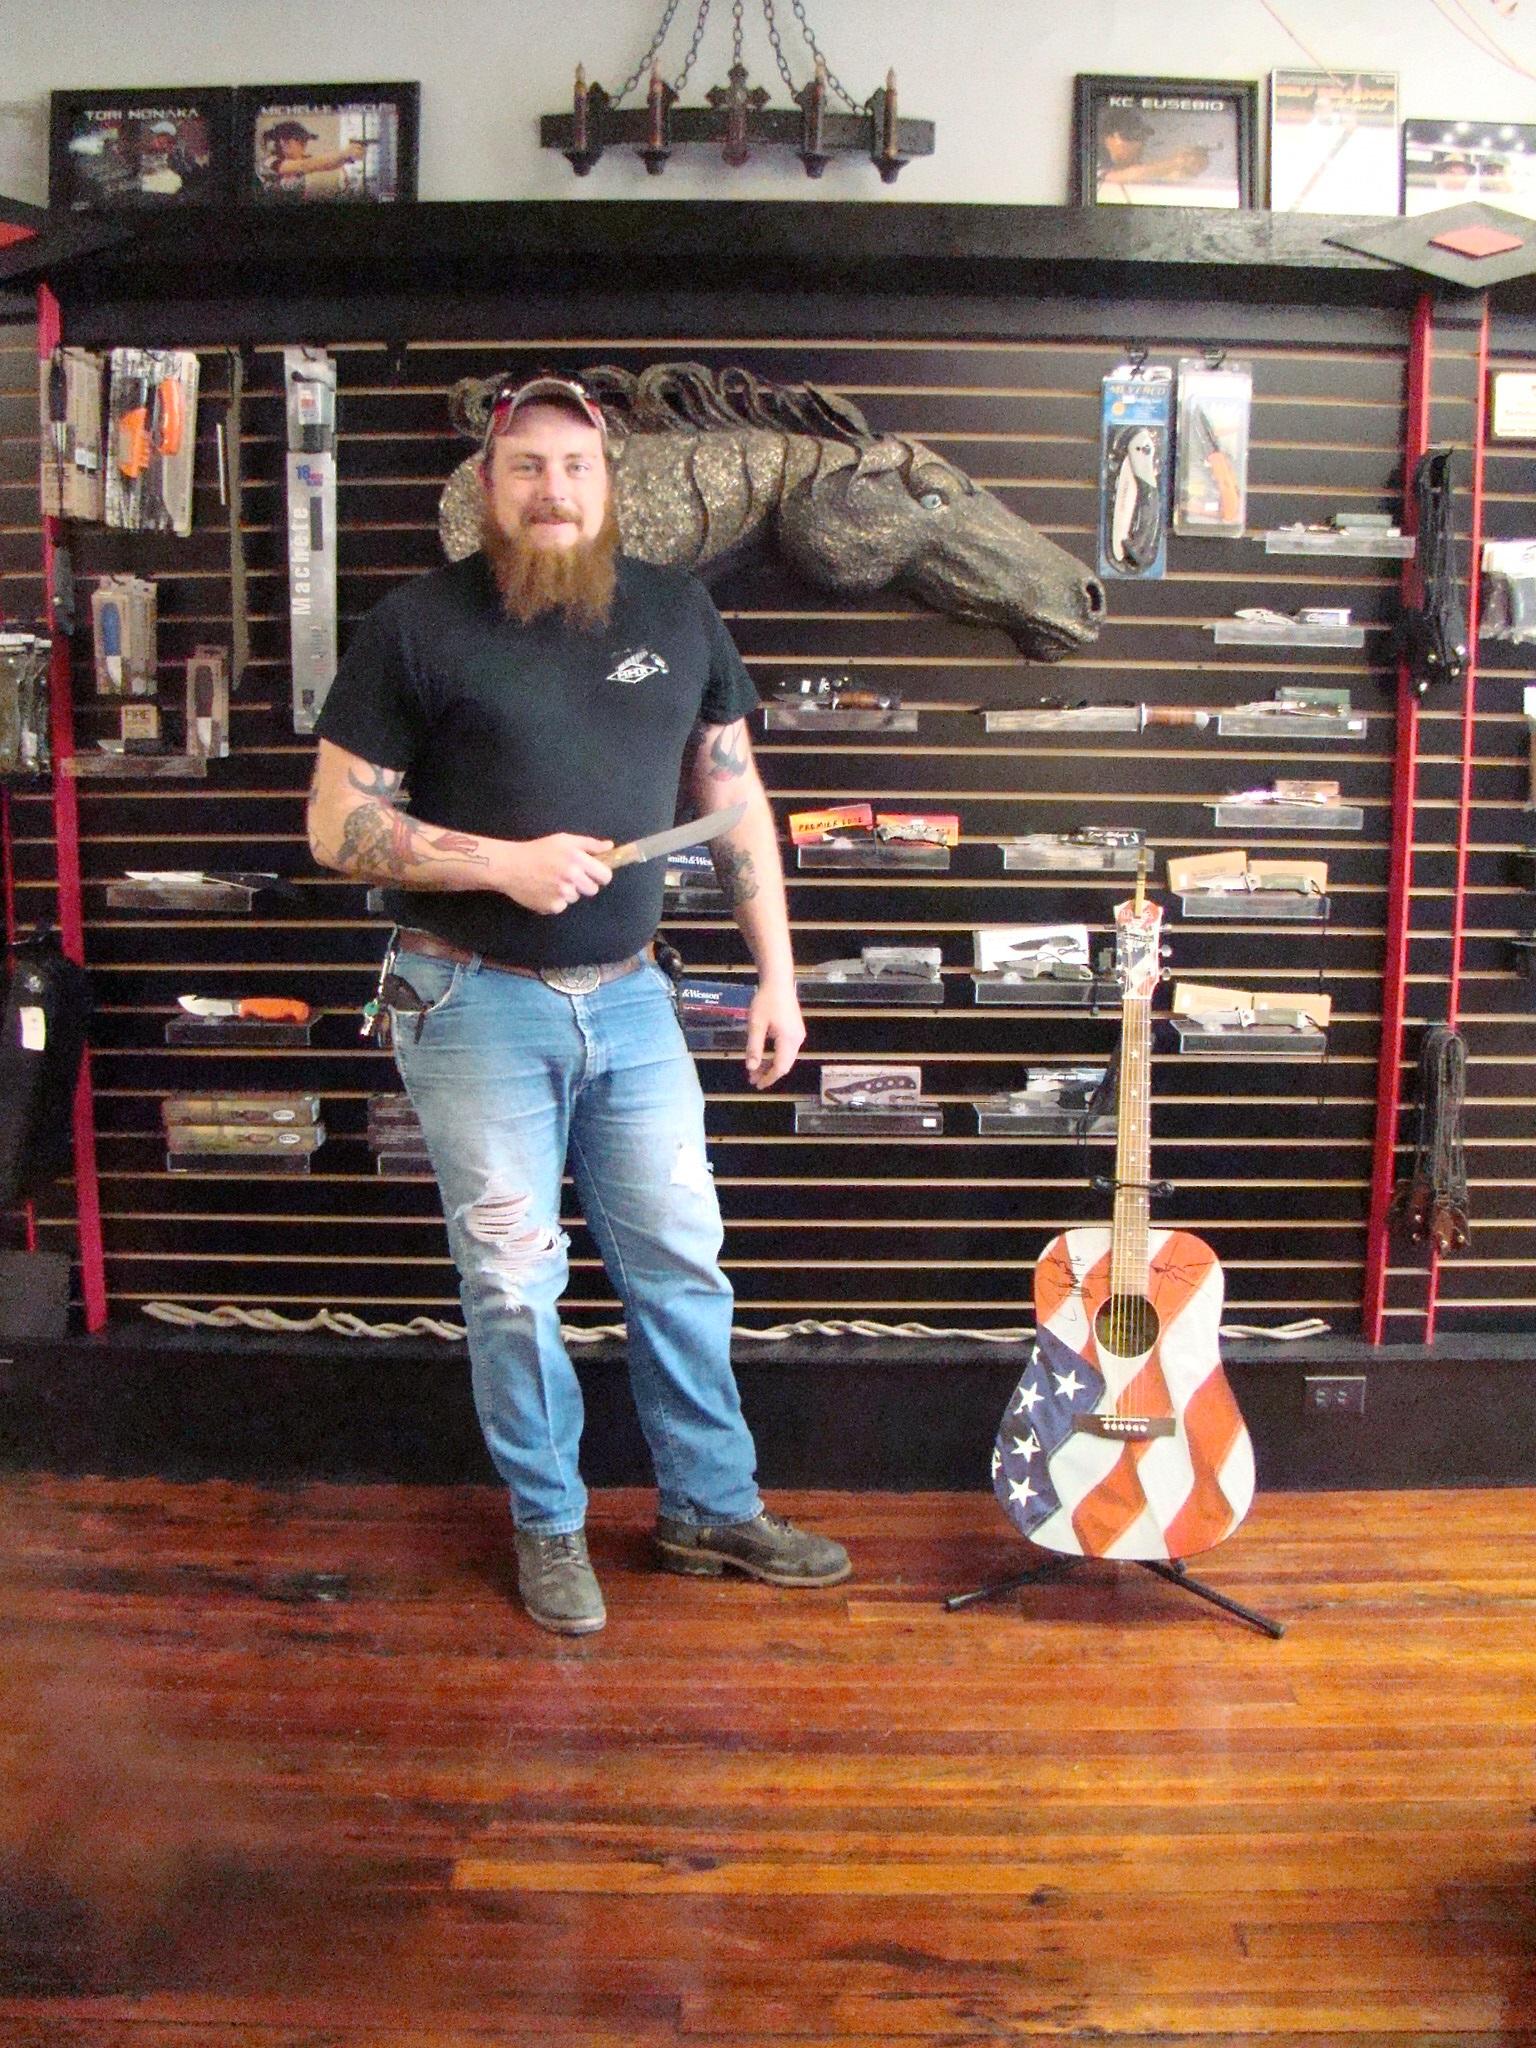 BHK Tom Casterline with Ted Nugent guitar